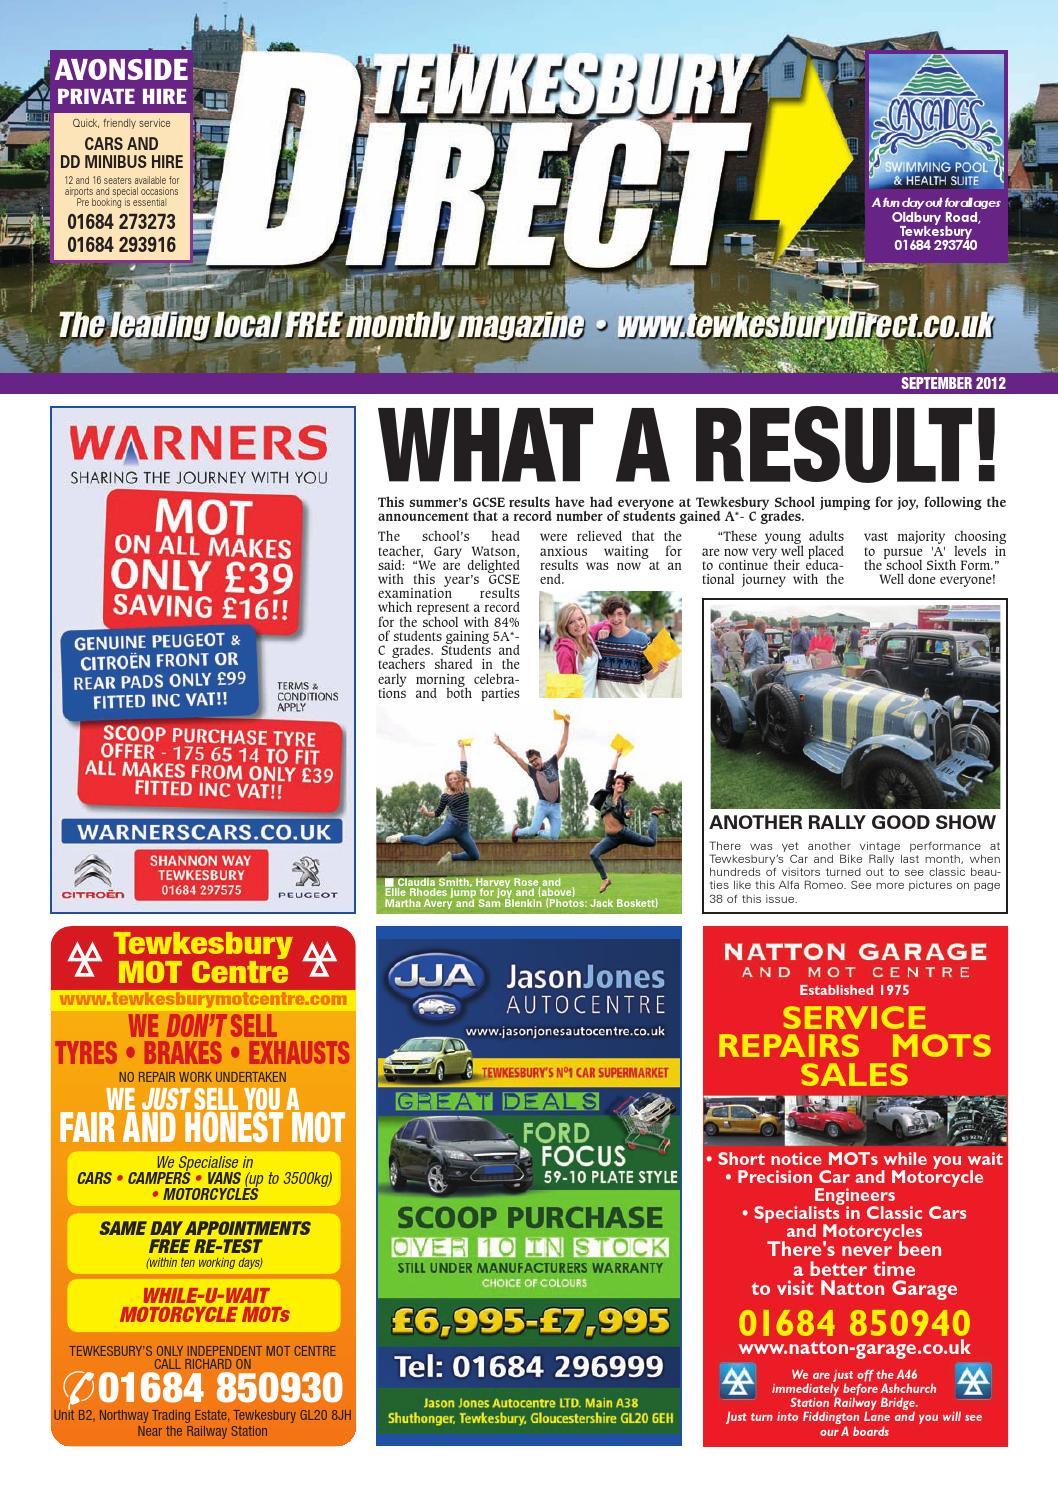 Tewkesbury Direct Magazine September 2012 by Tewkesbury